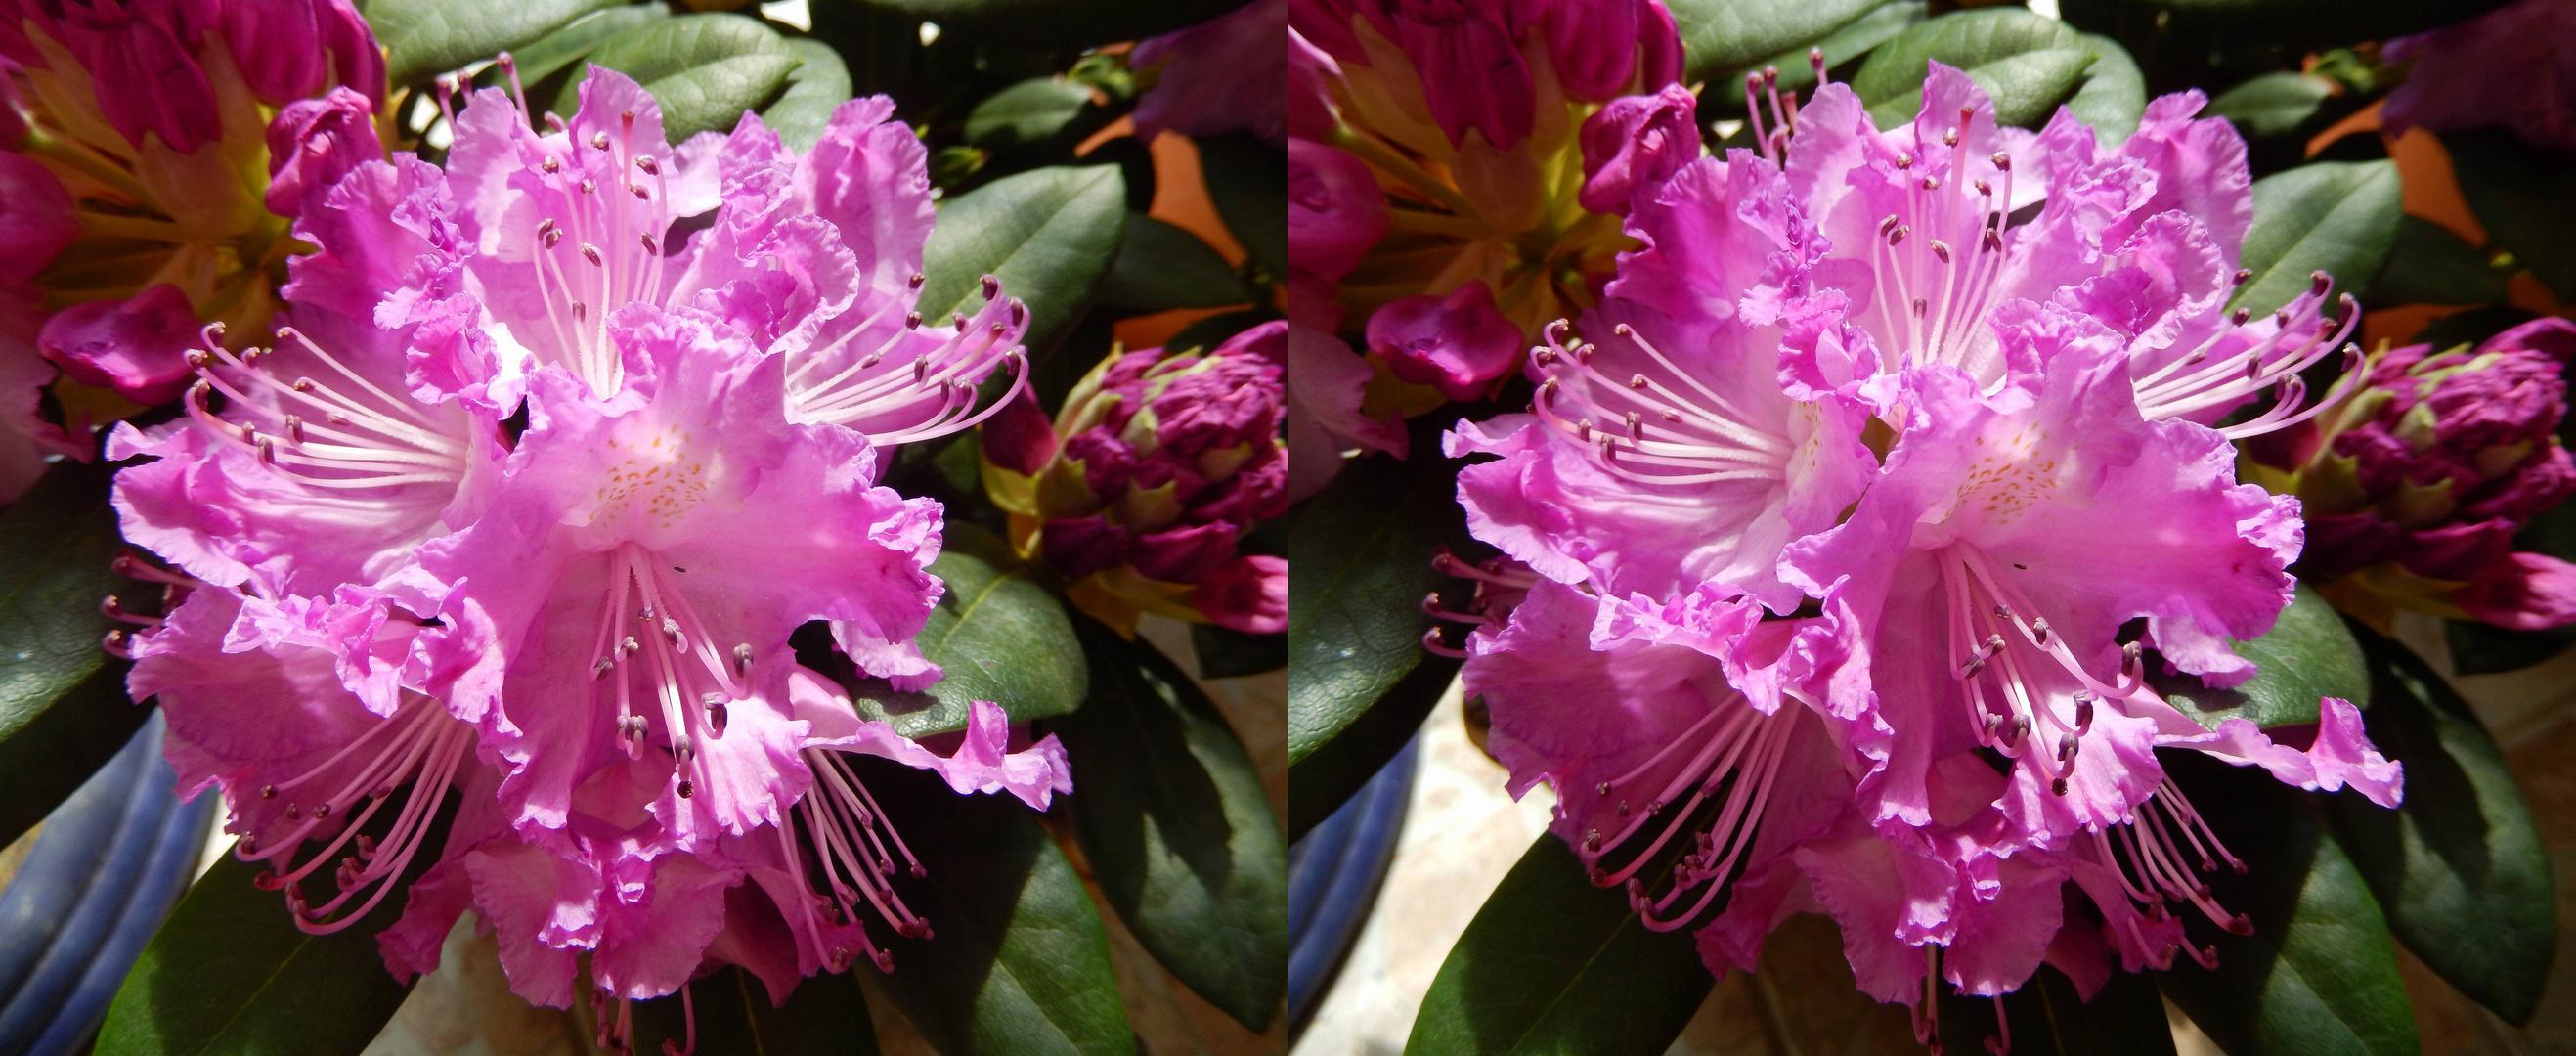 DSCN0466_Rhododendron Hybride - 'Alfred'